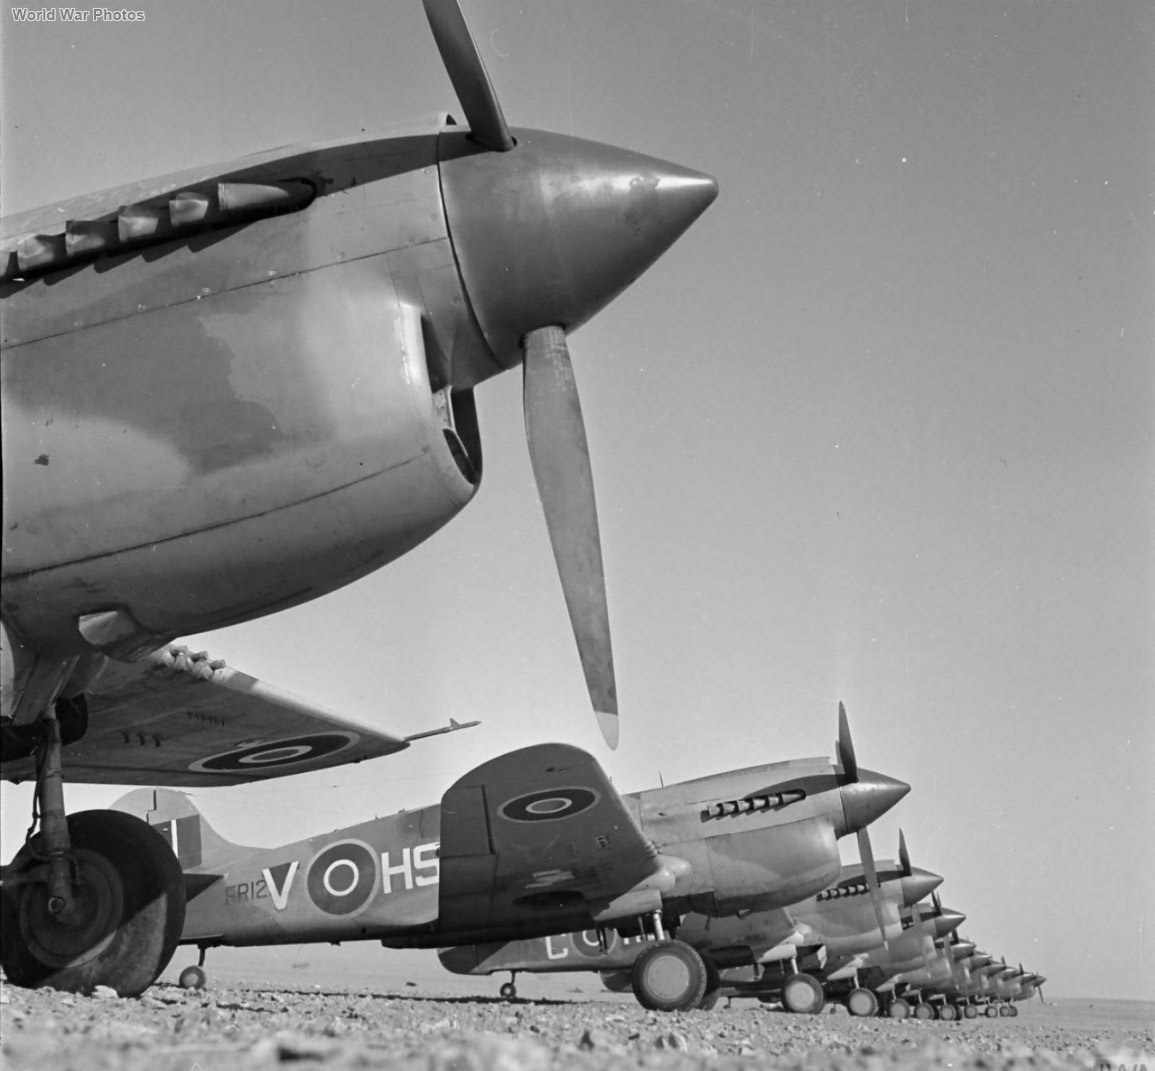 Kittyhawks III of No. 260 Squadron RAF December 1942